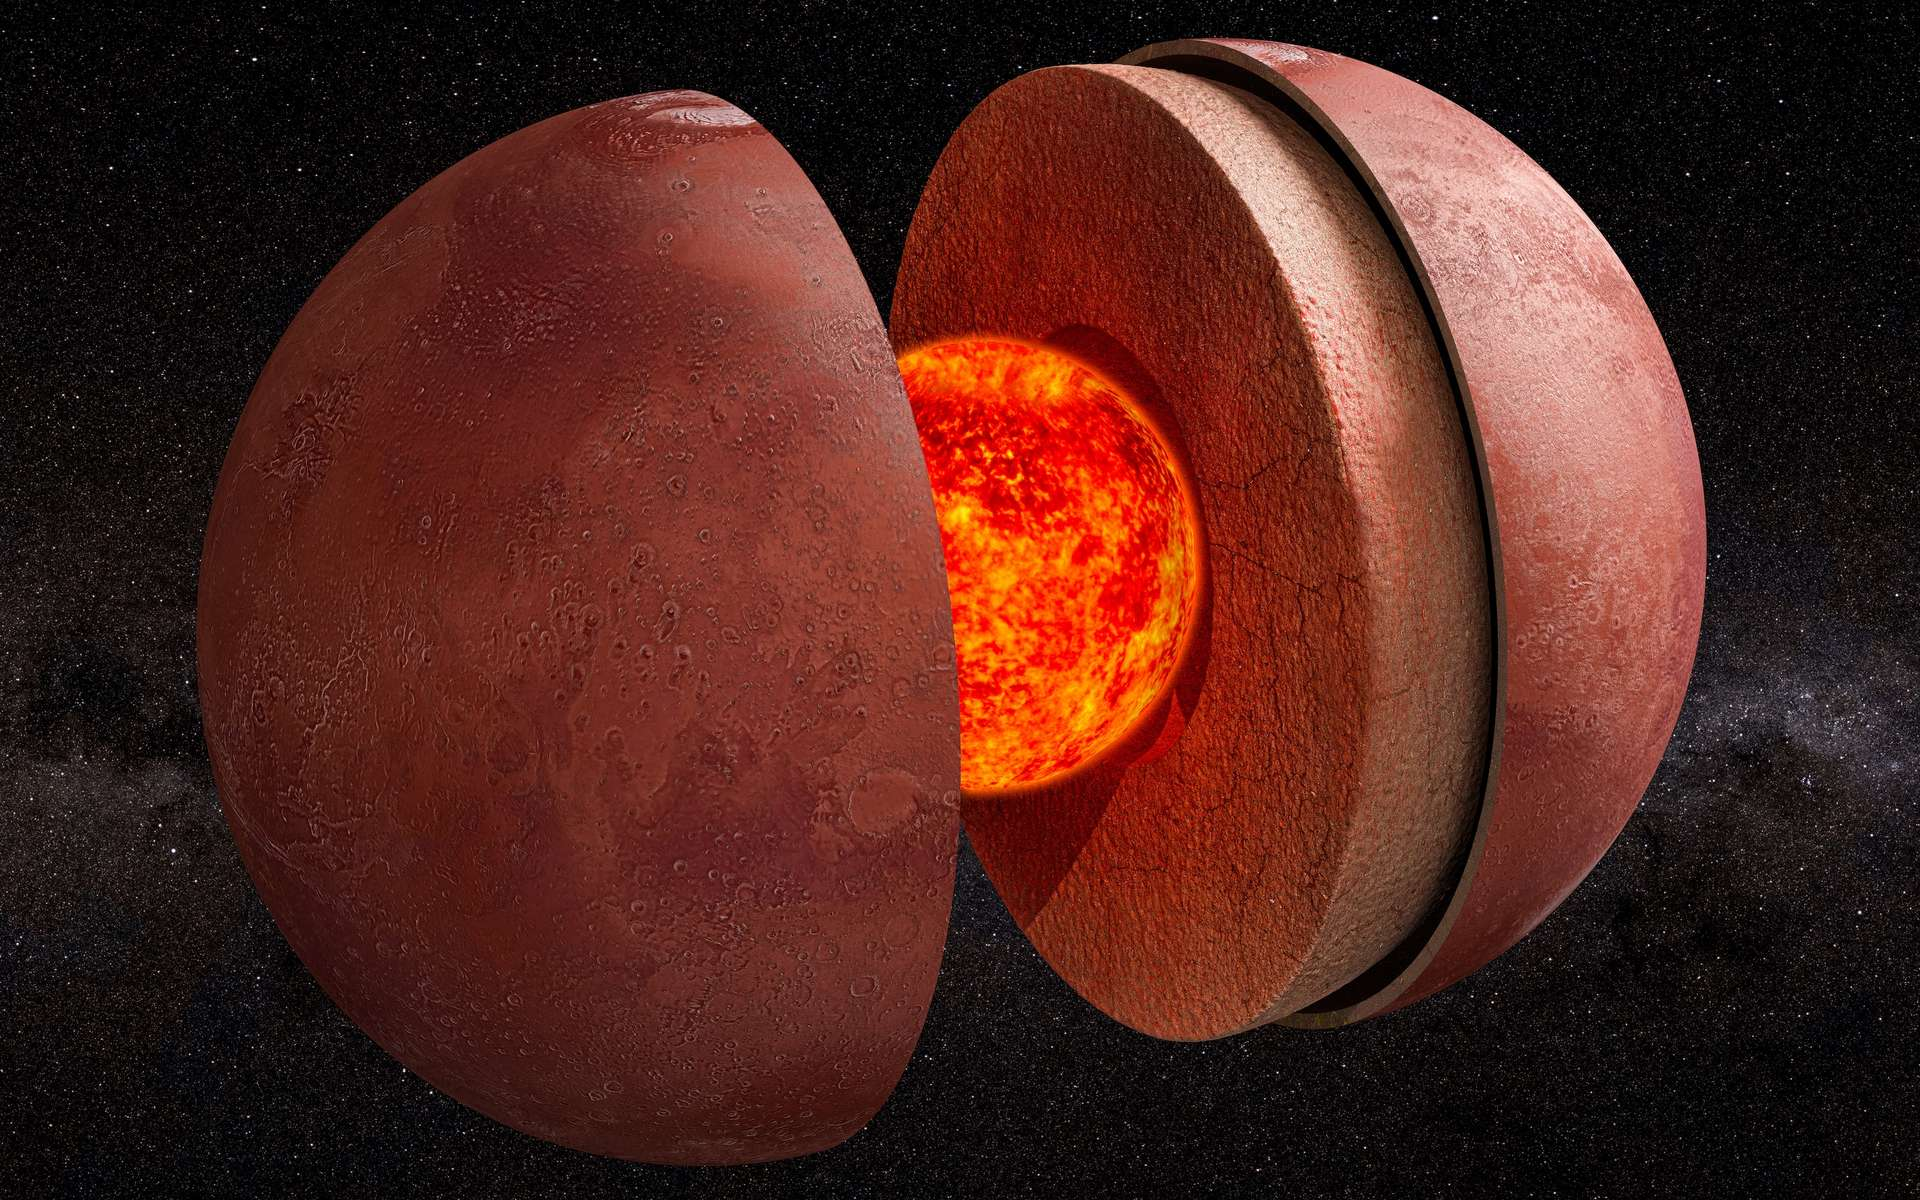 Vue éclatée de la structure interne de Mars. © alexlmx, Adobe Stock